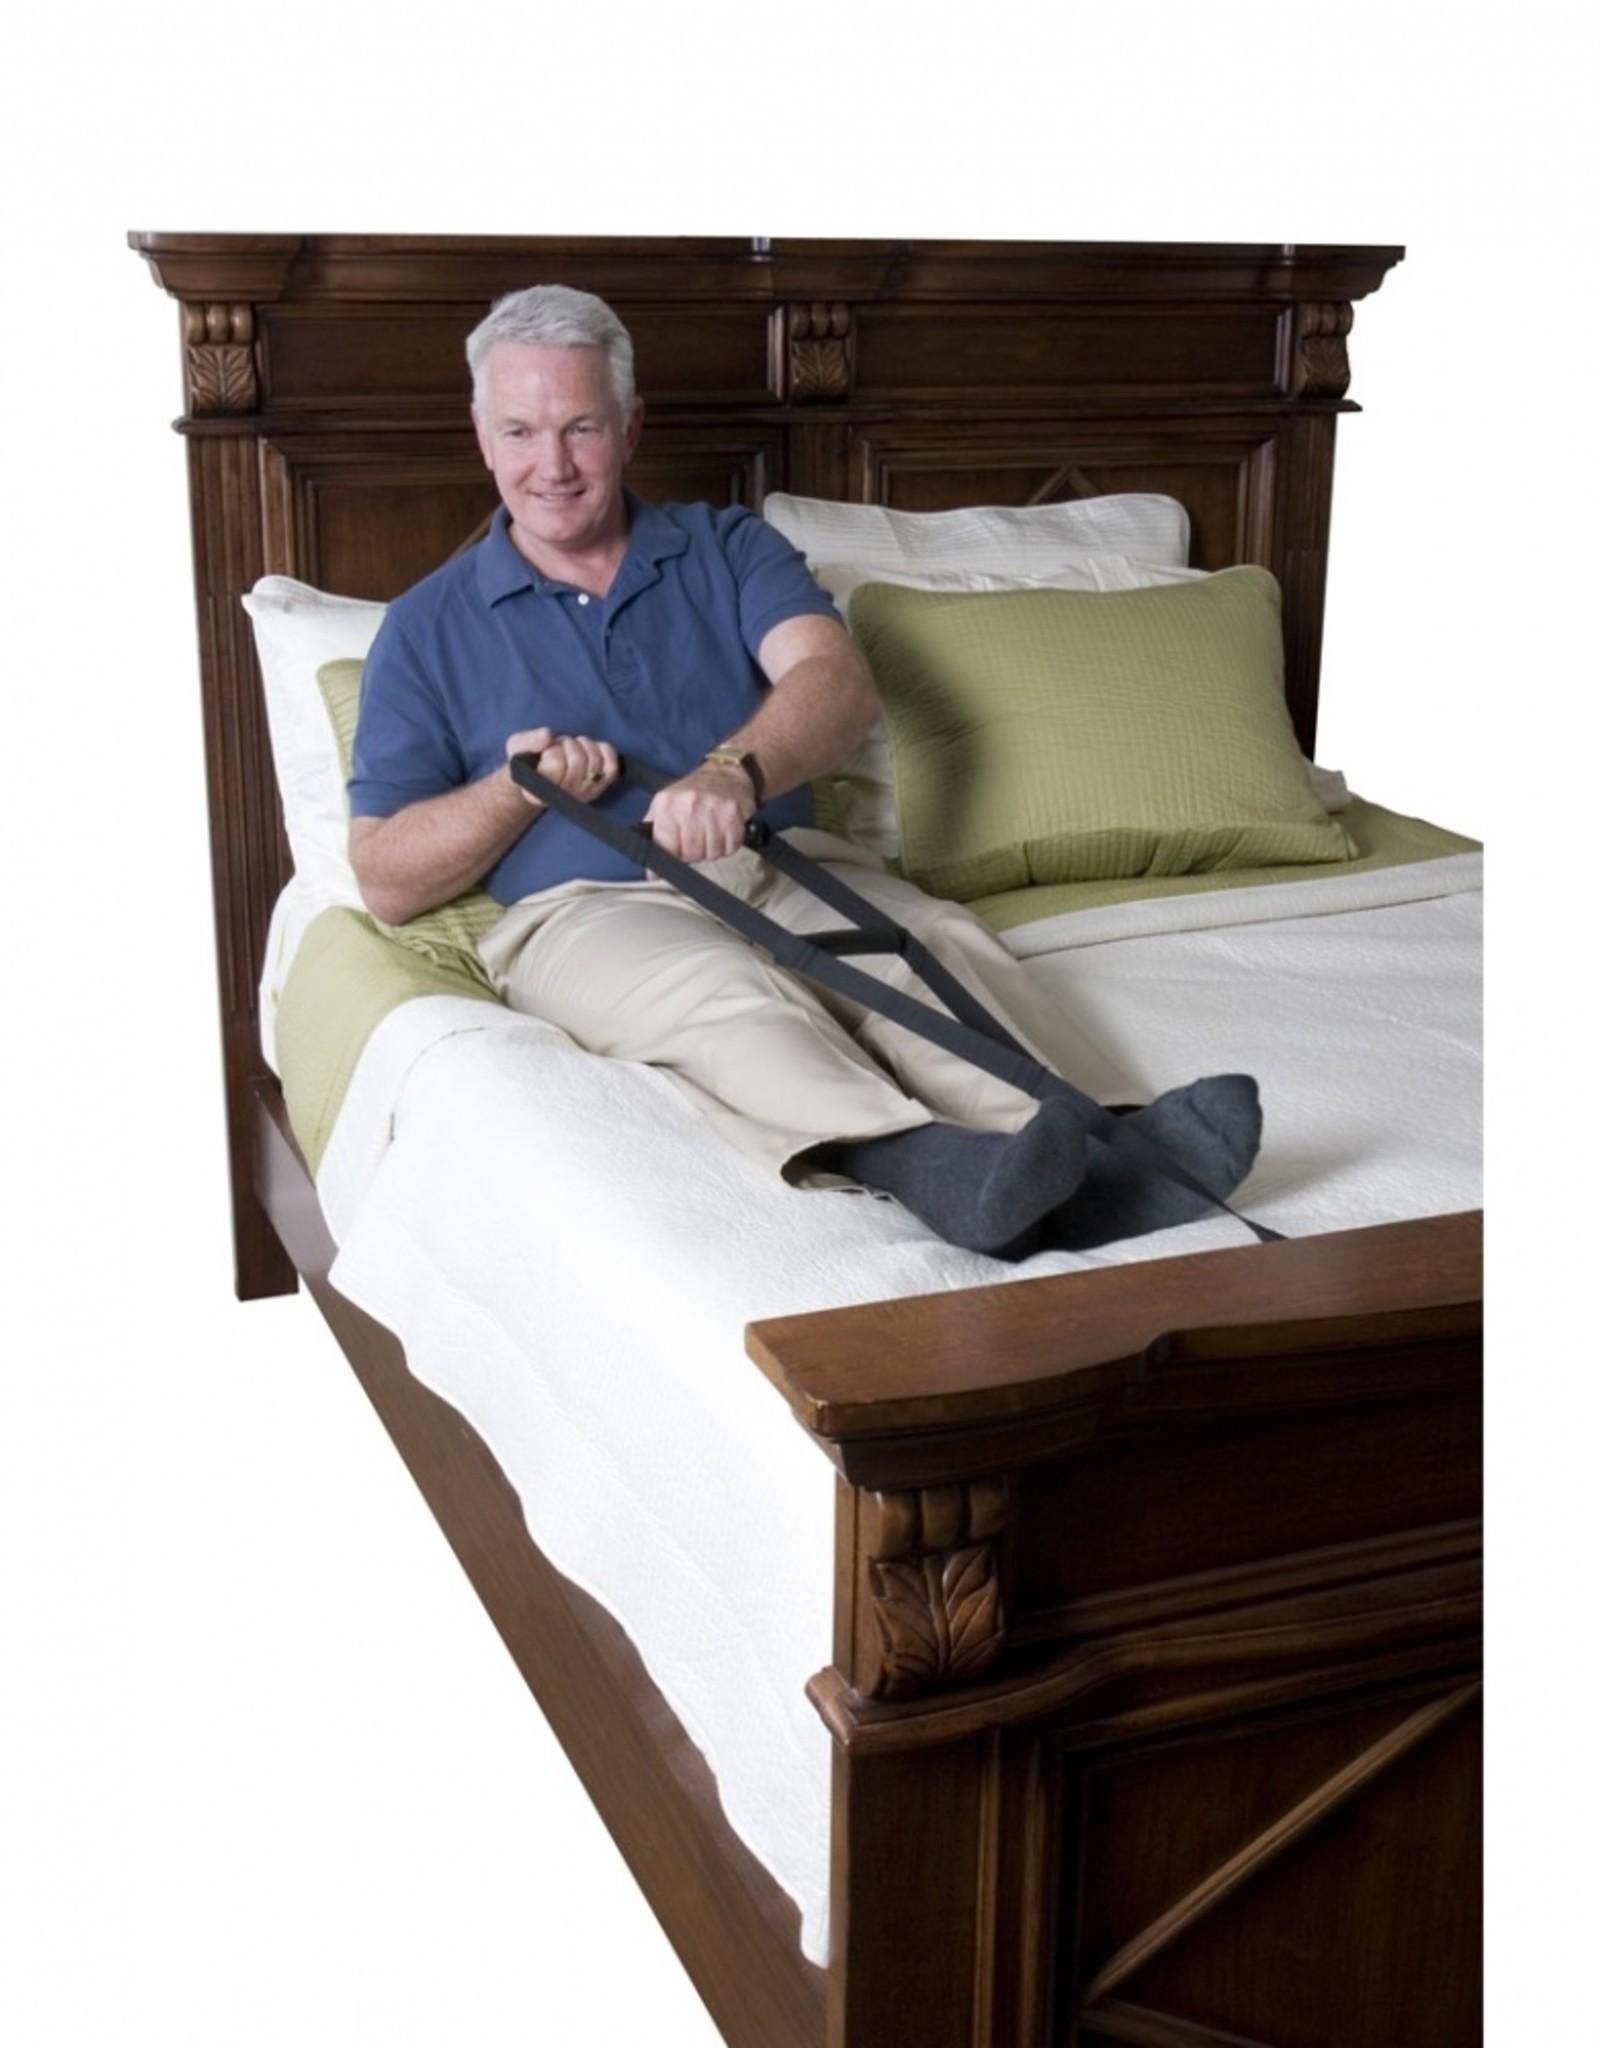 Bedtouwladder